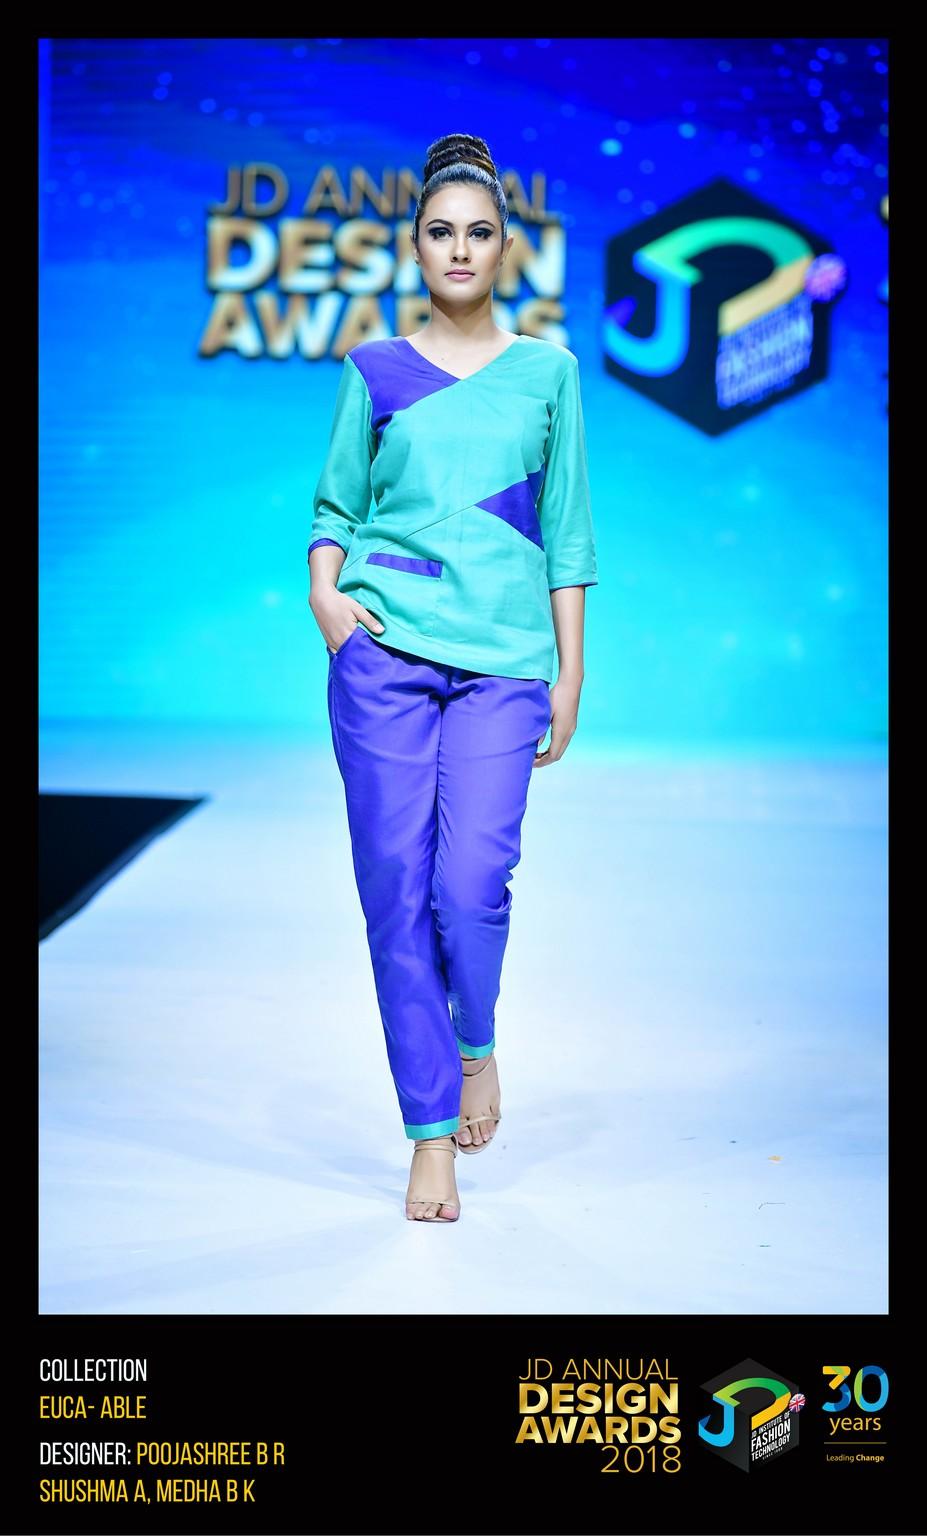 Euca-able – Change – JD Annual Design Awards 2018 | Designer: Poojashree, Sushma and Medha | Photography : Jerin Nath (@jerin_nath) euca-able – change – jd annual design awards 2018 - EUCA ABLE 7 - Euca-able – Change – JD Annual Design Awards 2018